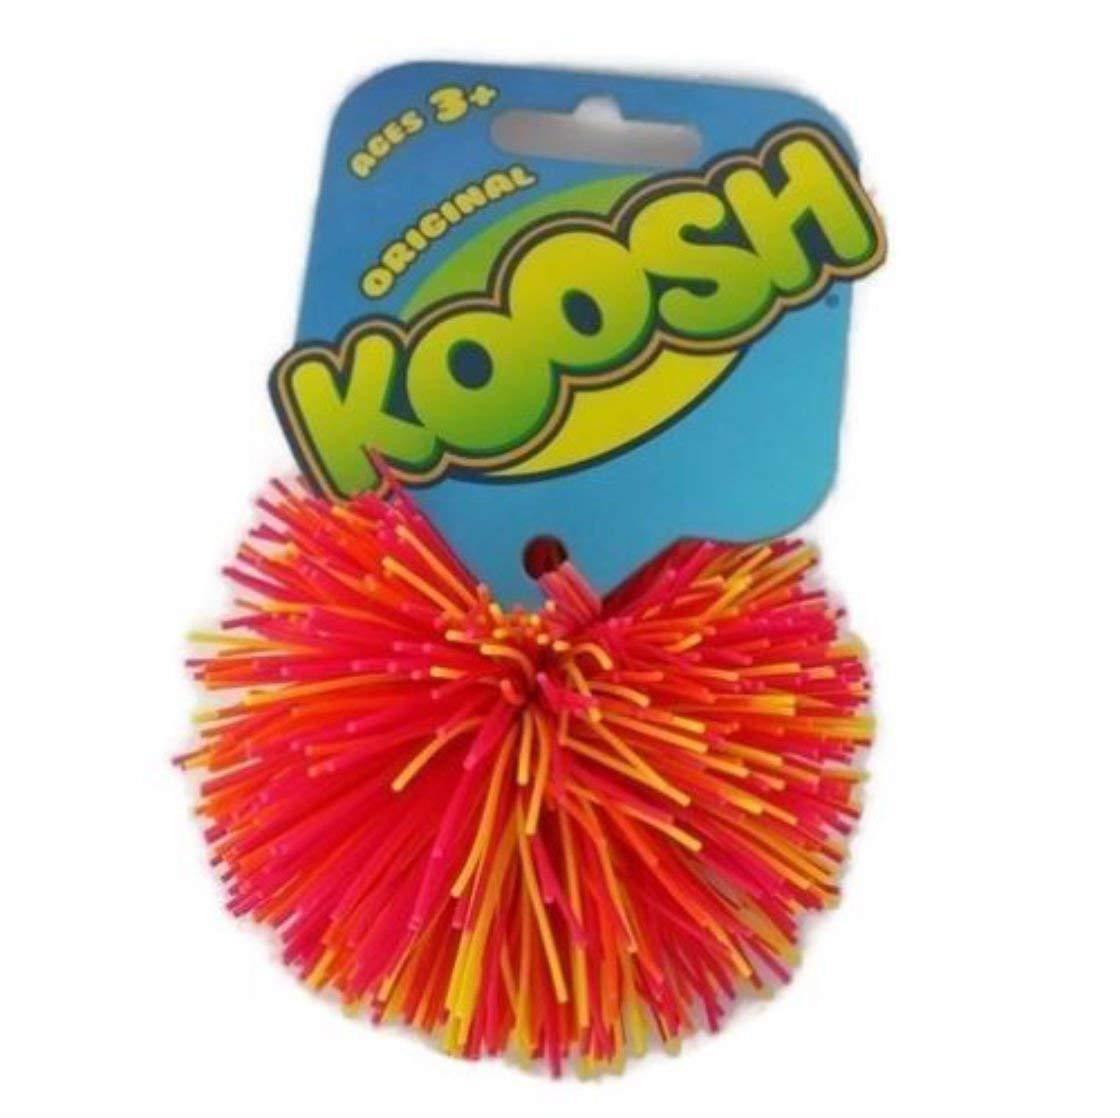 (1) Oddzon Hasbro Koosh Ball Fidget Autism Dyslexia Special Need Natural Latex (yellow, orange, purple confetti )